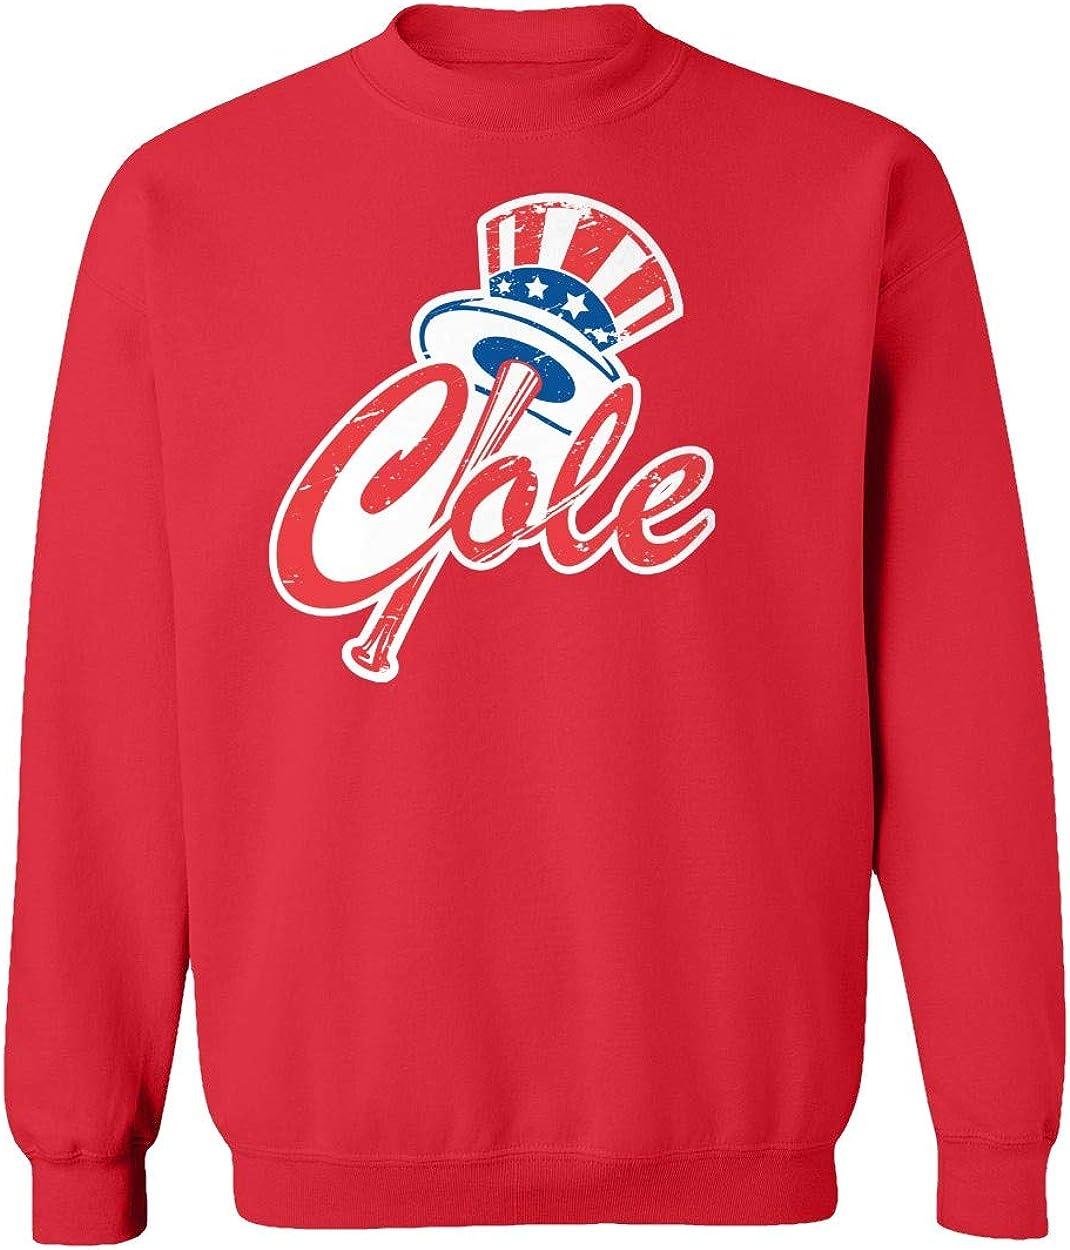 Baku Apparel New York Fans NY Cole Logo Unisex Youth Sweatshirt